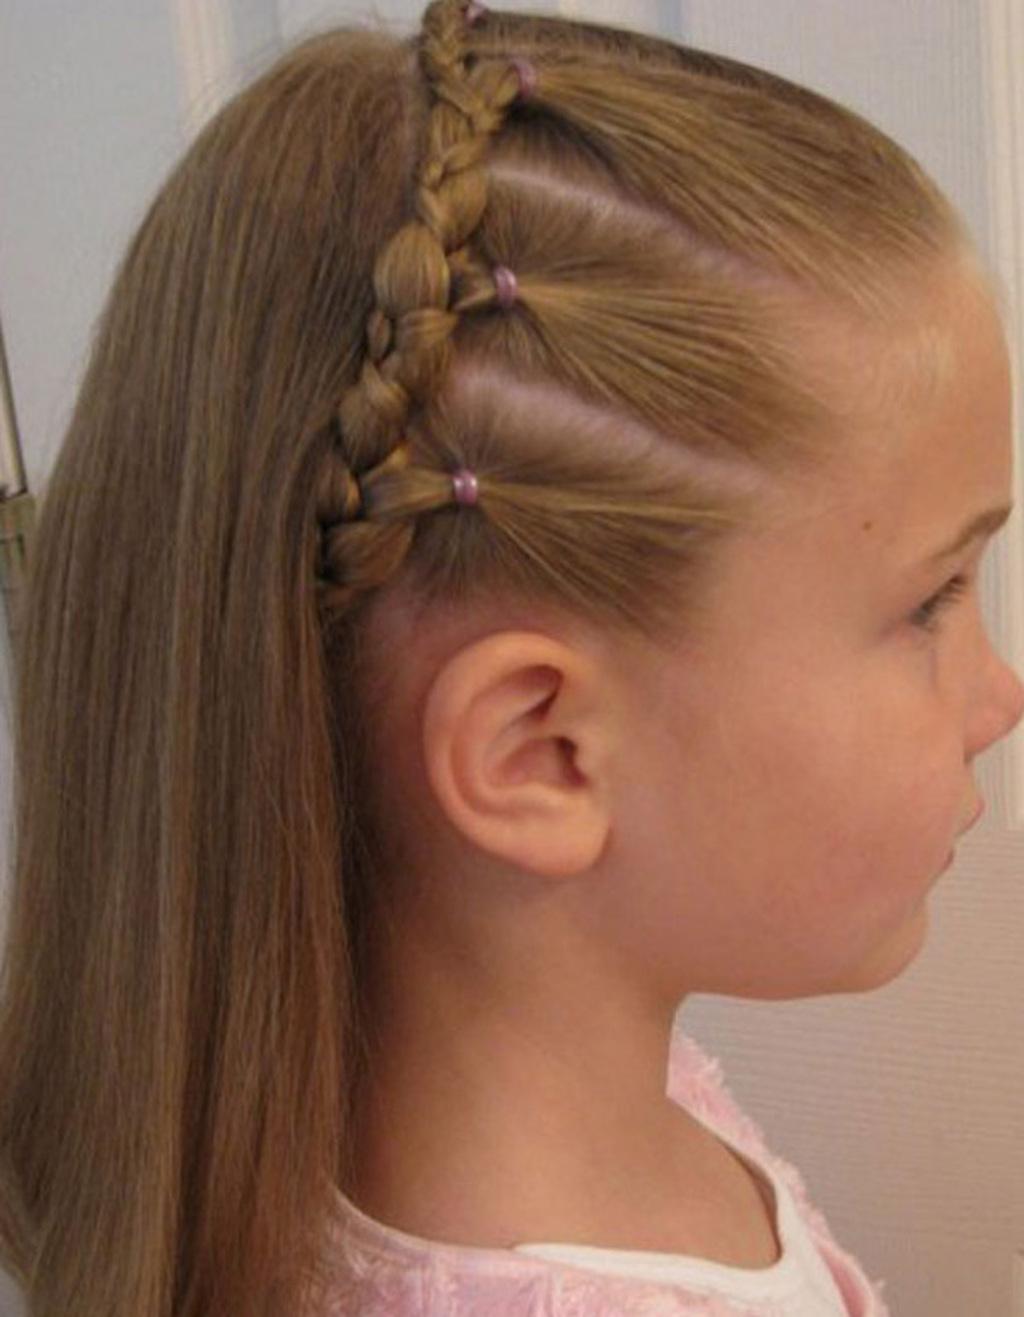 Детские причёски своими руками фото